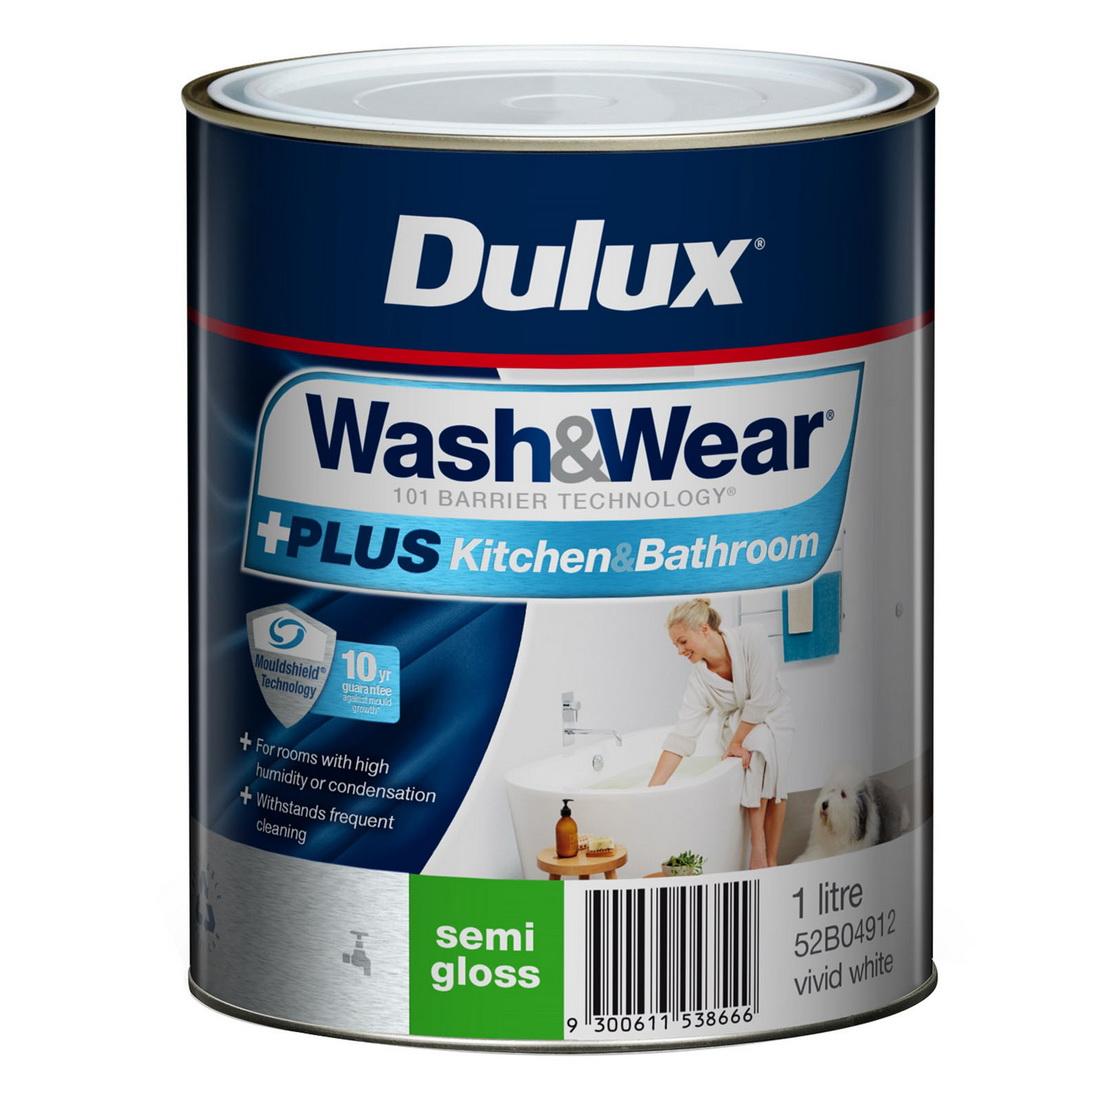 Wash And Wear Plus Kitchen And Bathroom Semi Gloss Vivid White 1L